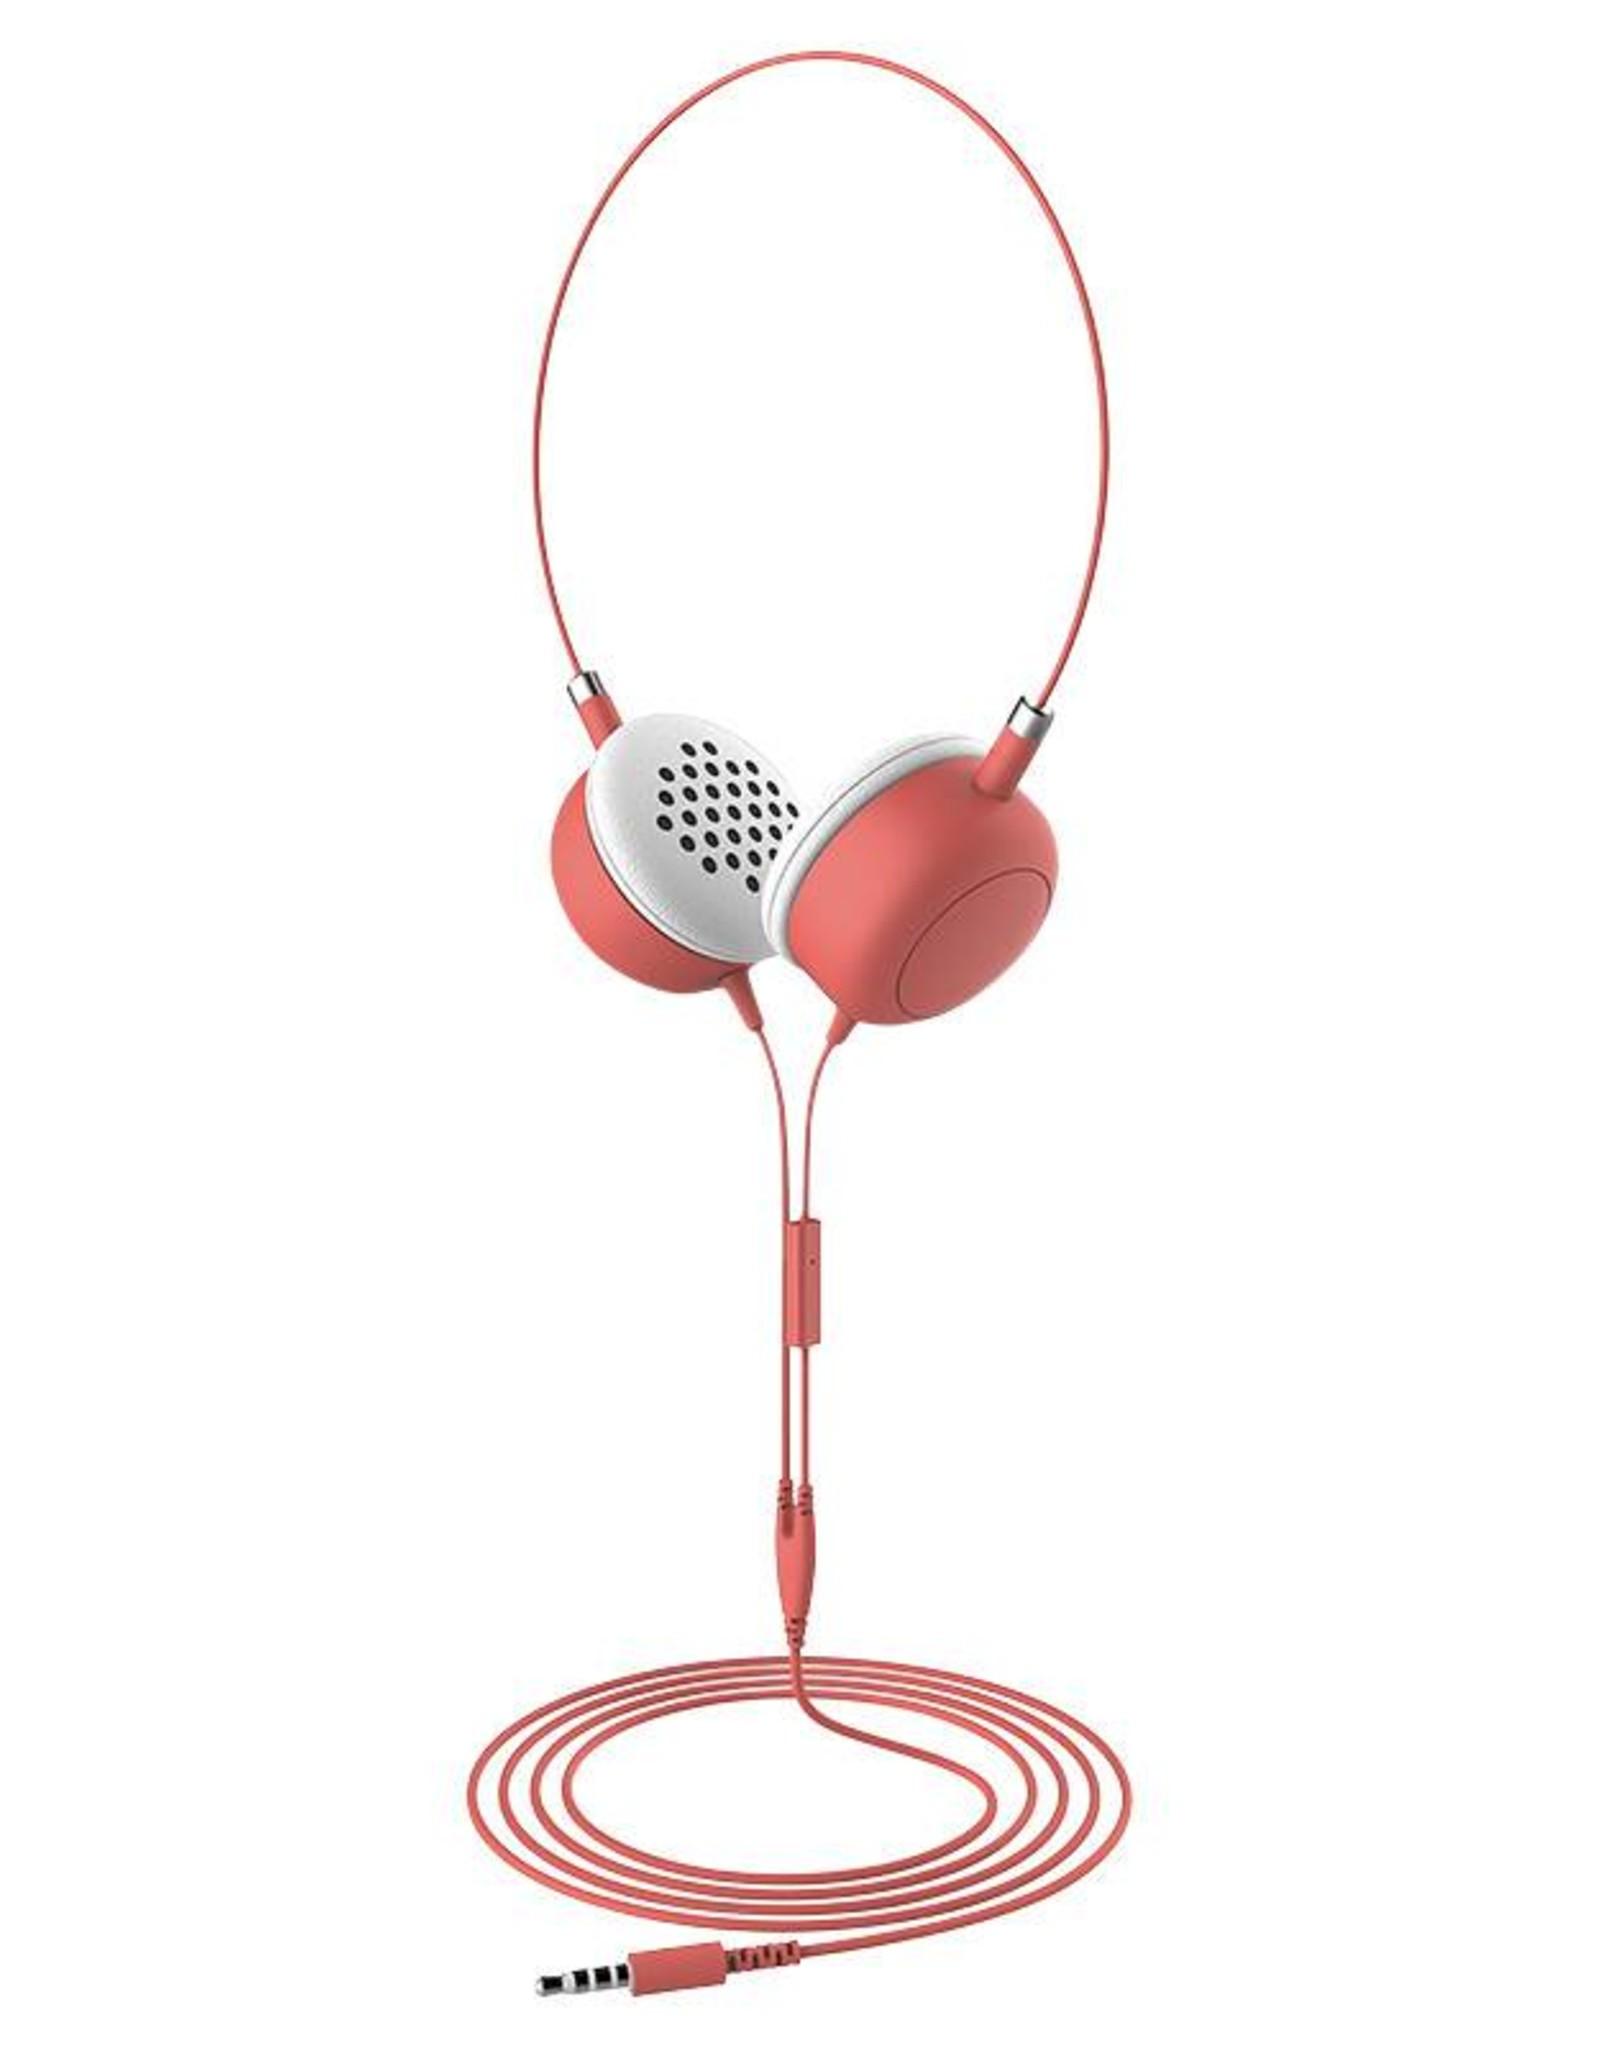 Furo | Macaron headphone Wired on ear - Coral | FT-12726